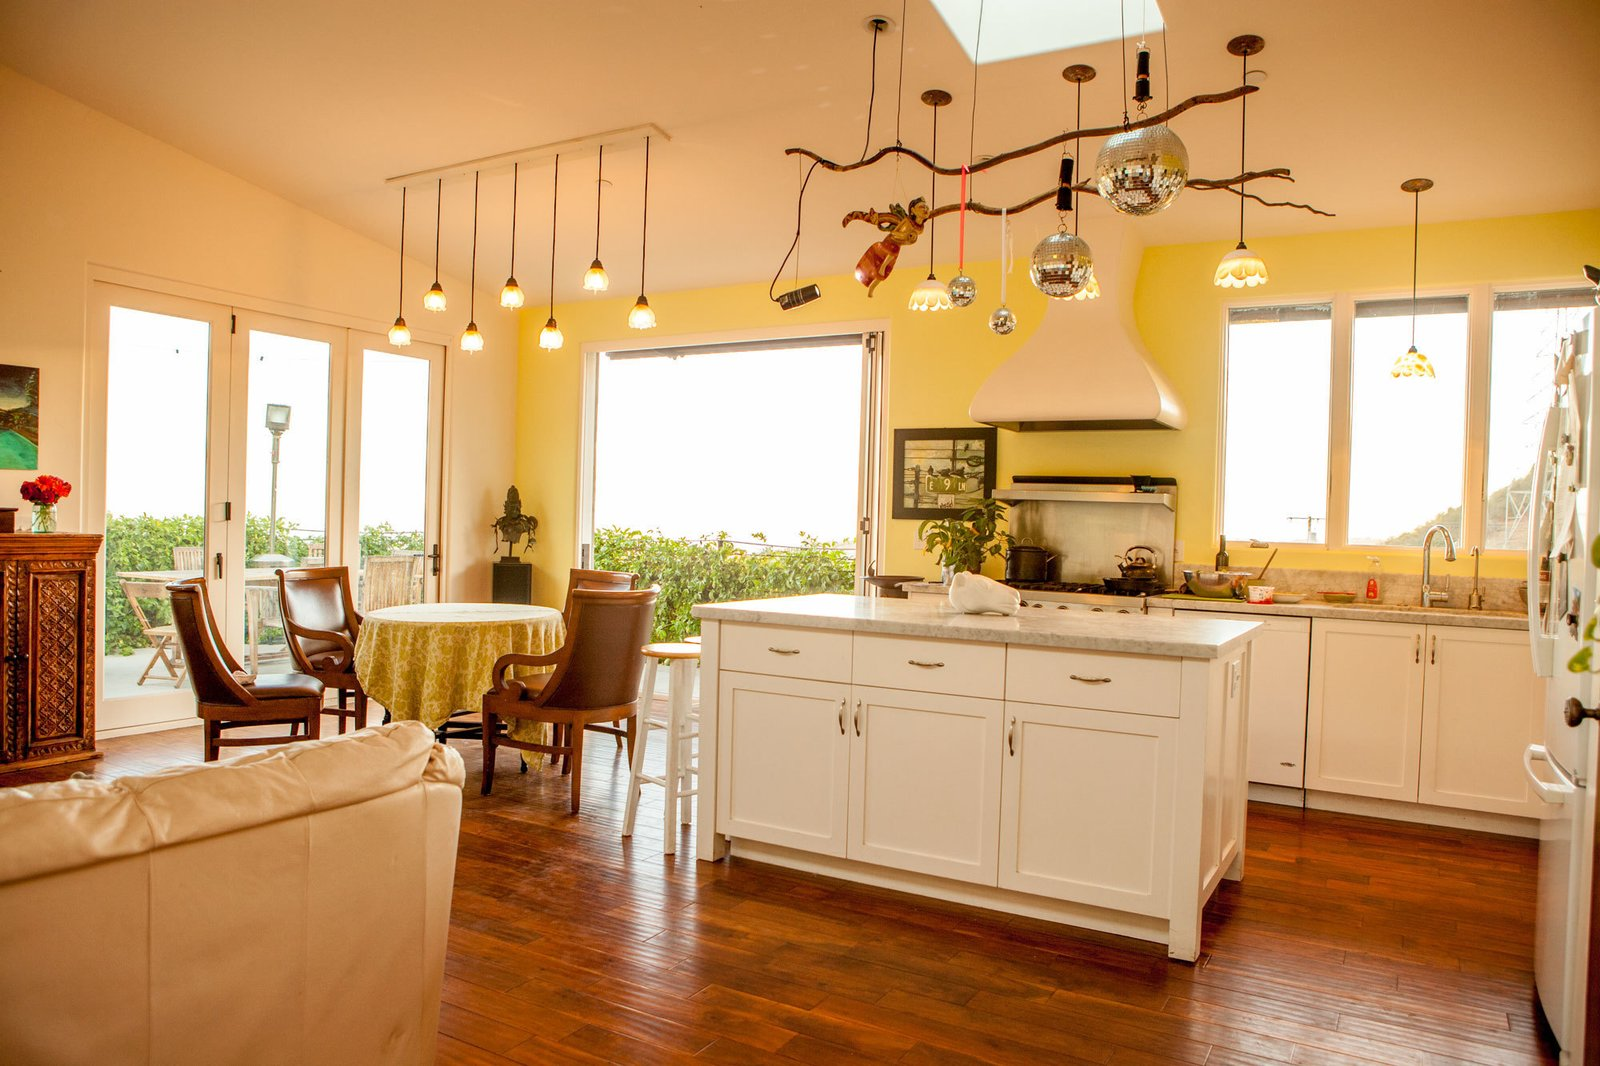 Metcalfe Residence by Jeff Shelton Architect